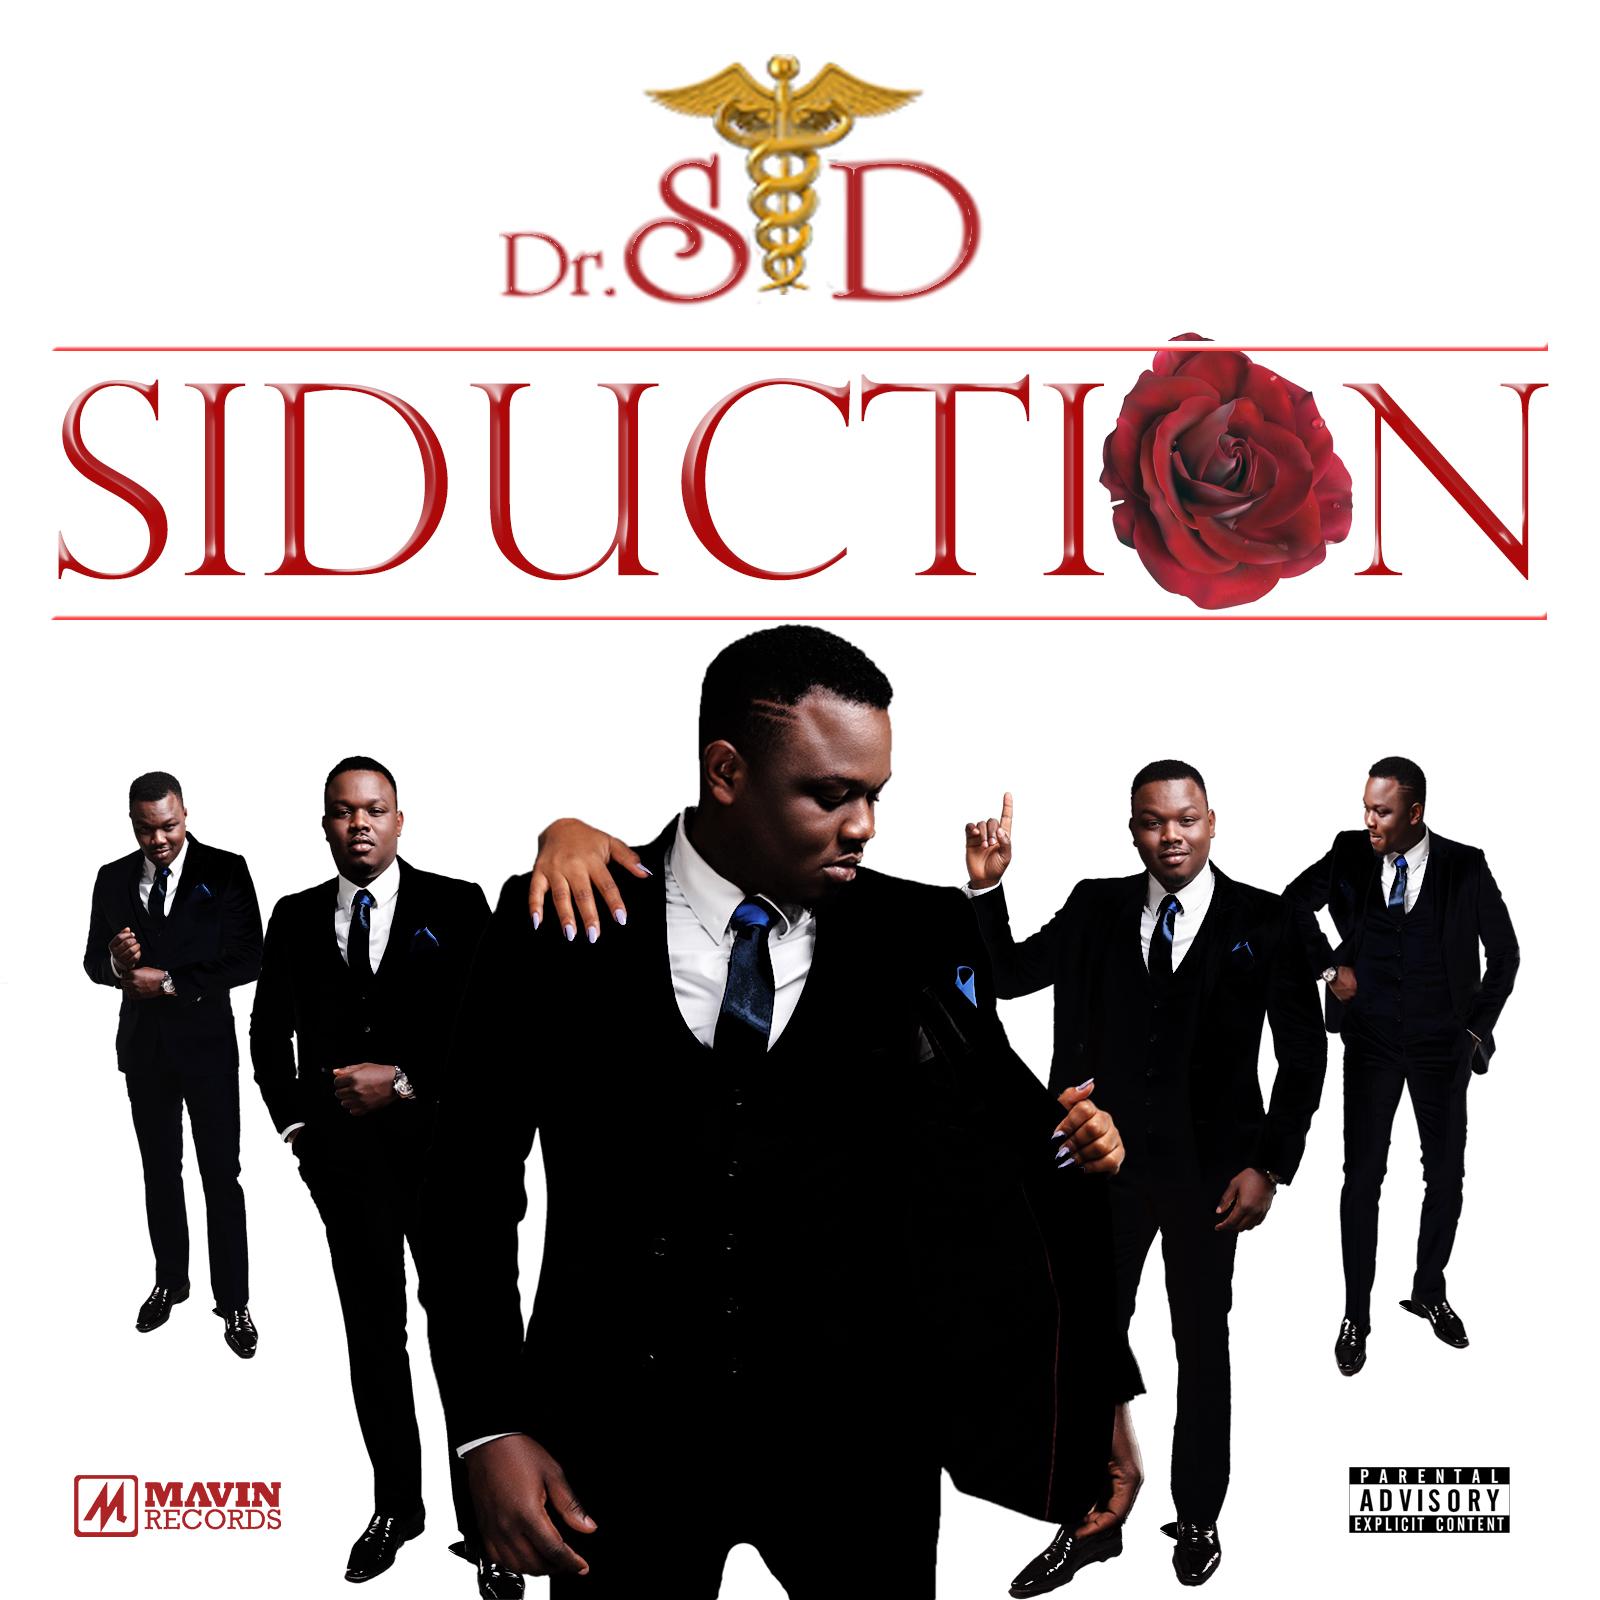 Dr SID SIDUCTION ART